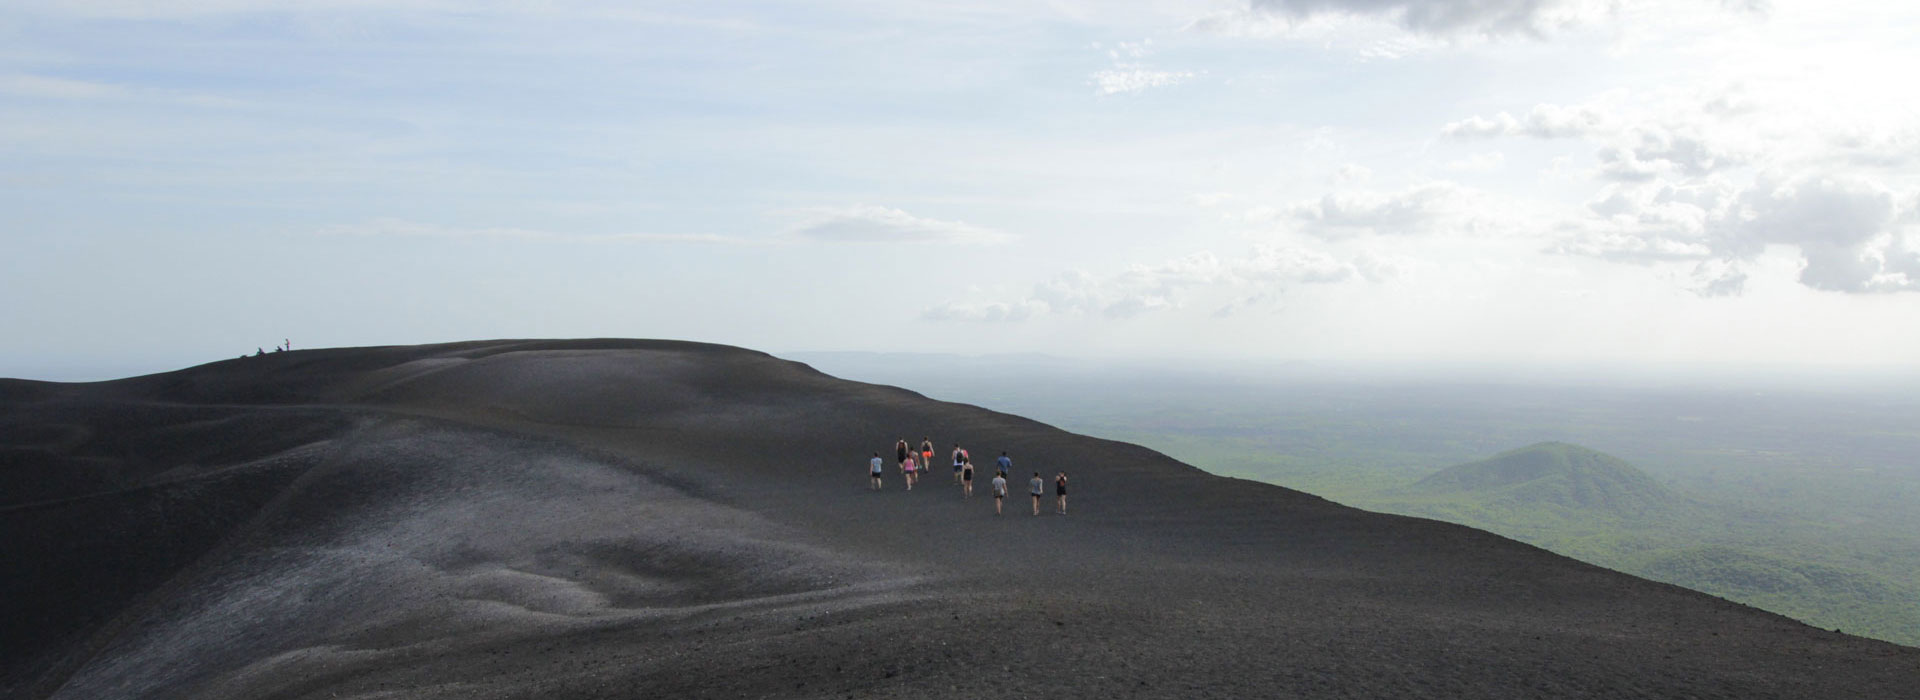 volcano-boarding-nicaragua-cerro-negro-surf-expedition